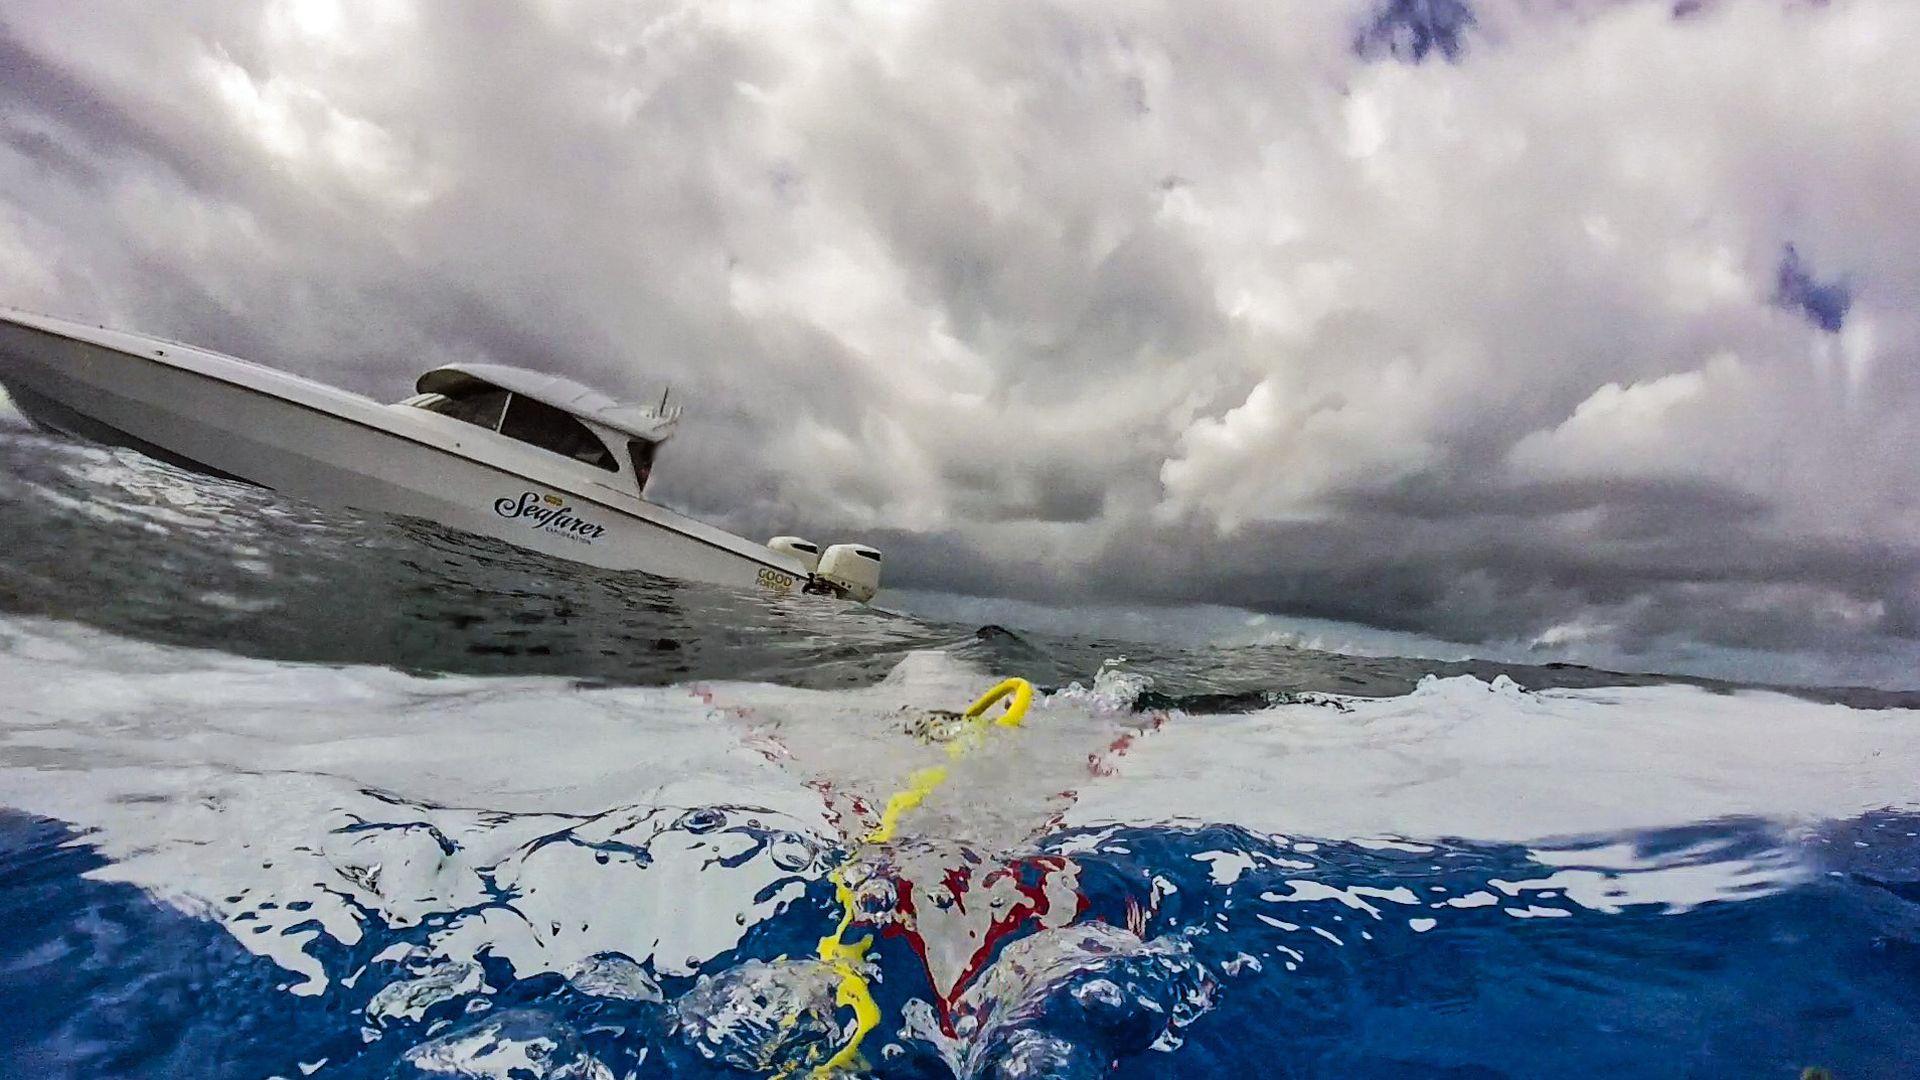 Seafarer-Exploration-Corp-SeaSearcher-Good-Fortune-7